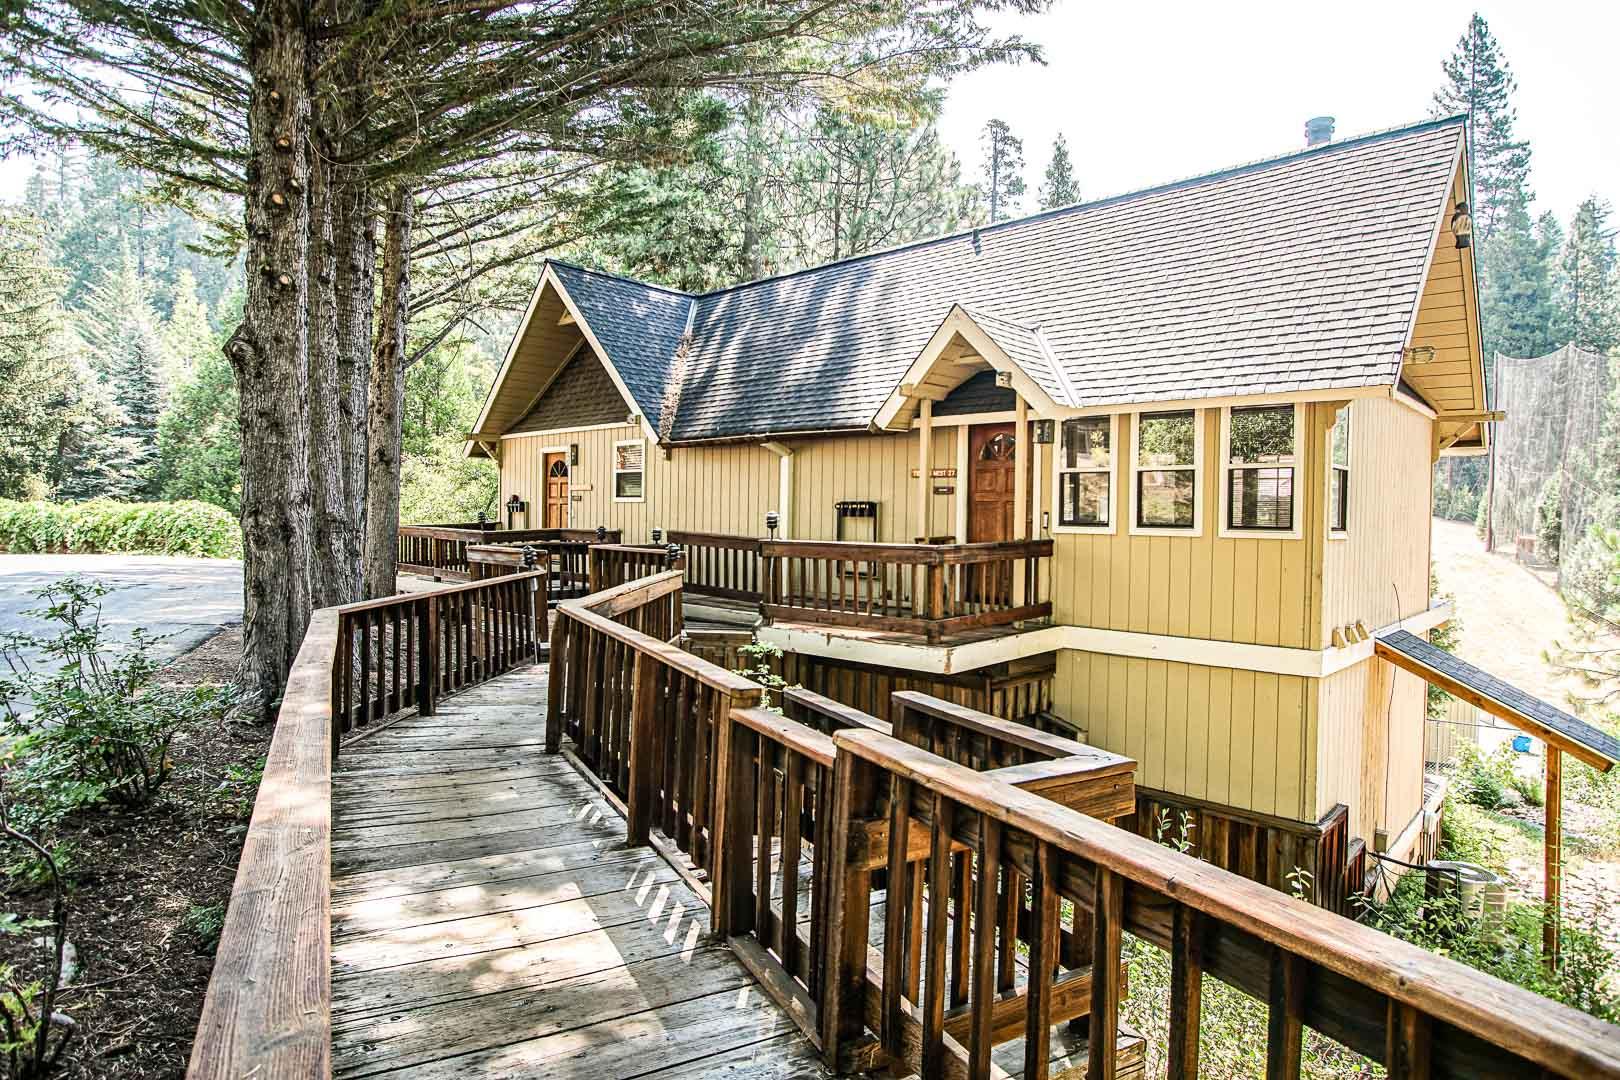 A peaceful view at VRI's Mountain Retreat Resort in California.